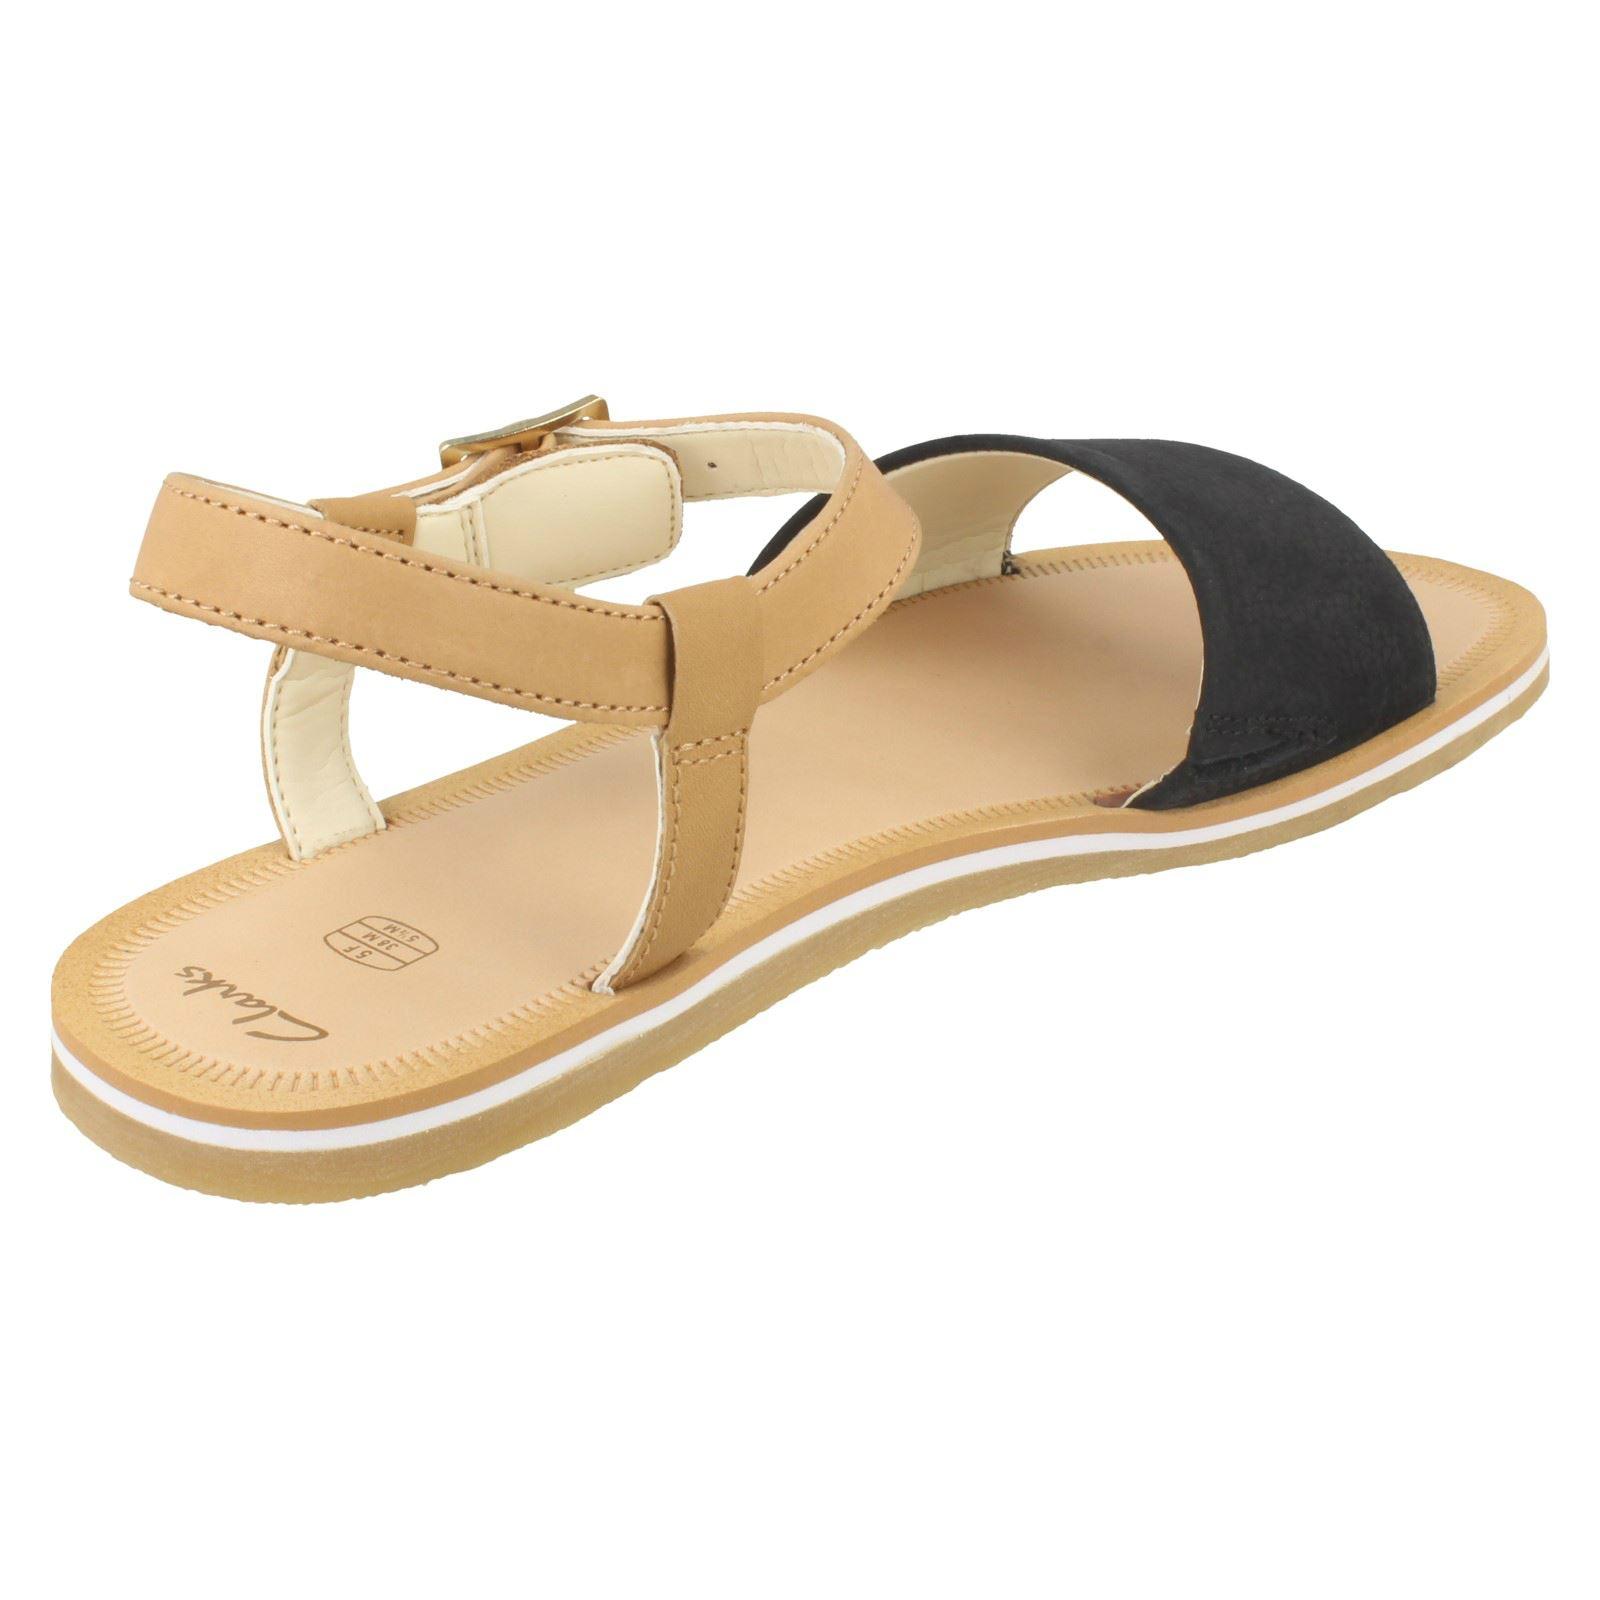 Girls Clarks Stylish Summer Sandals /'Skylark Pure Y/'